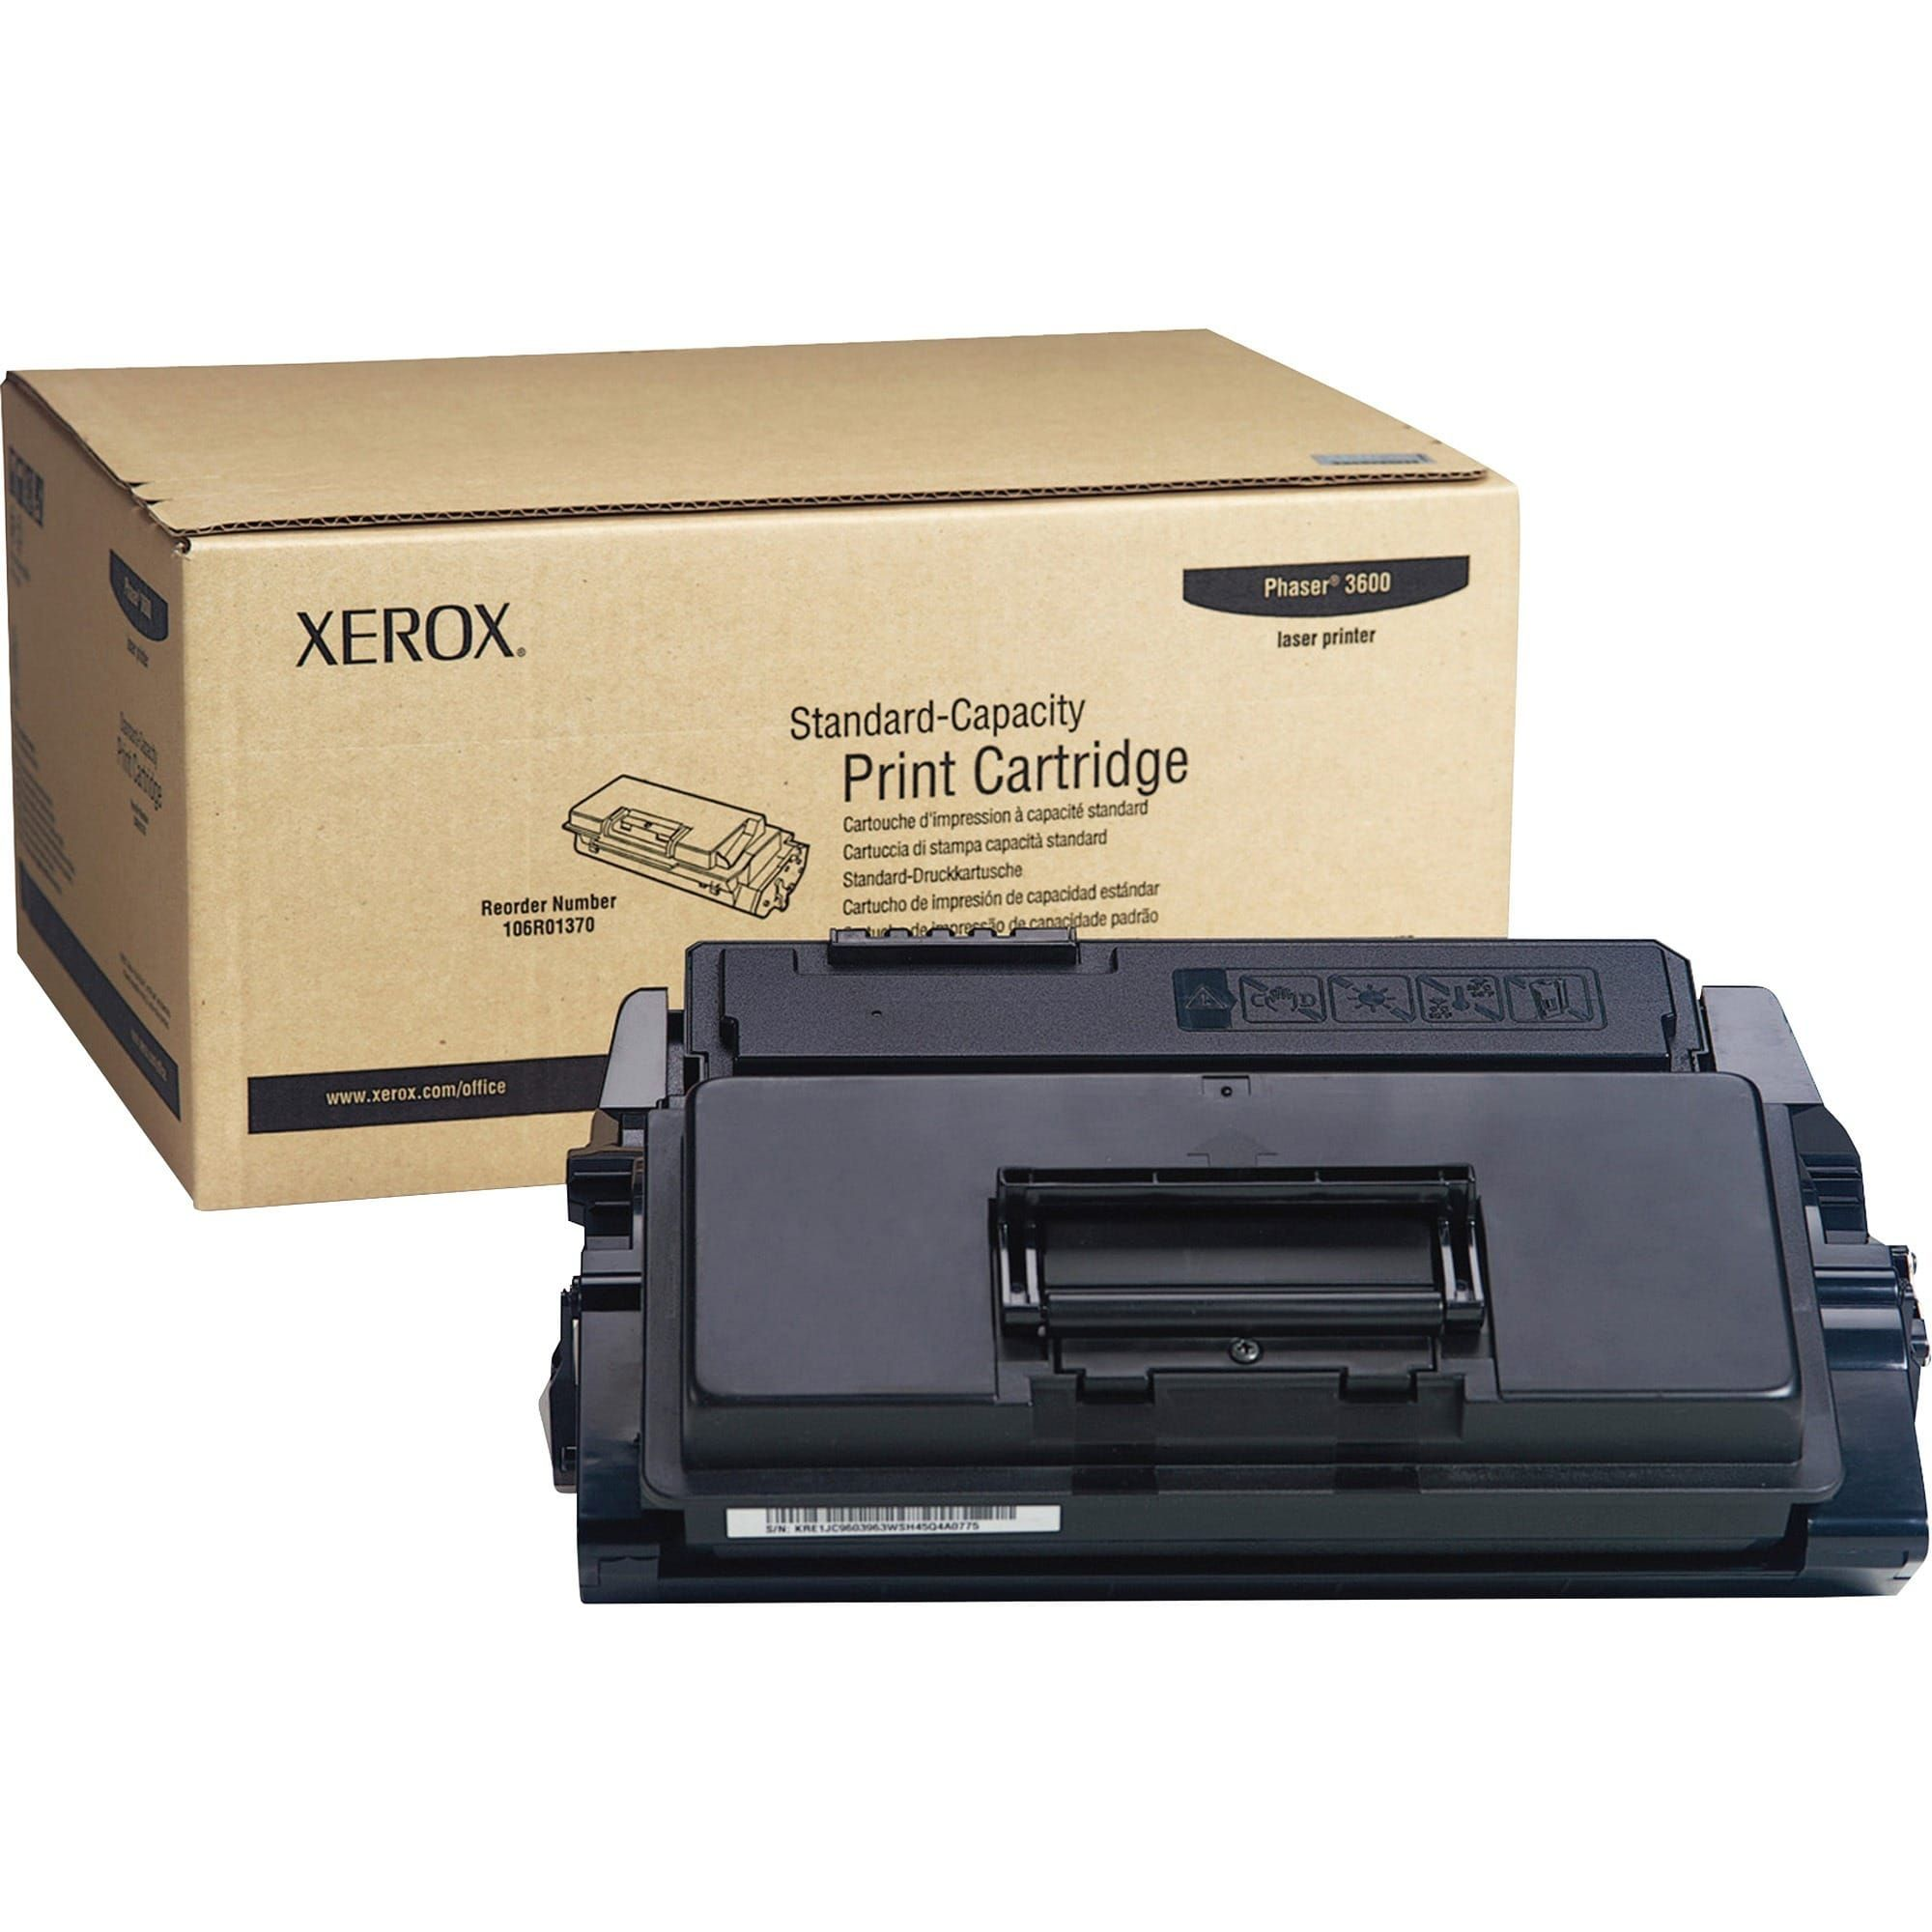 Xerox Original Toner Cartridge Standard Capacity Print